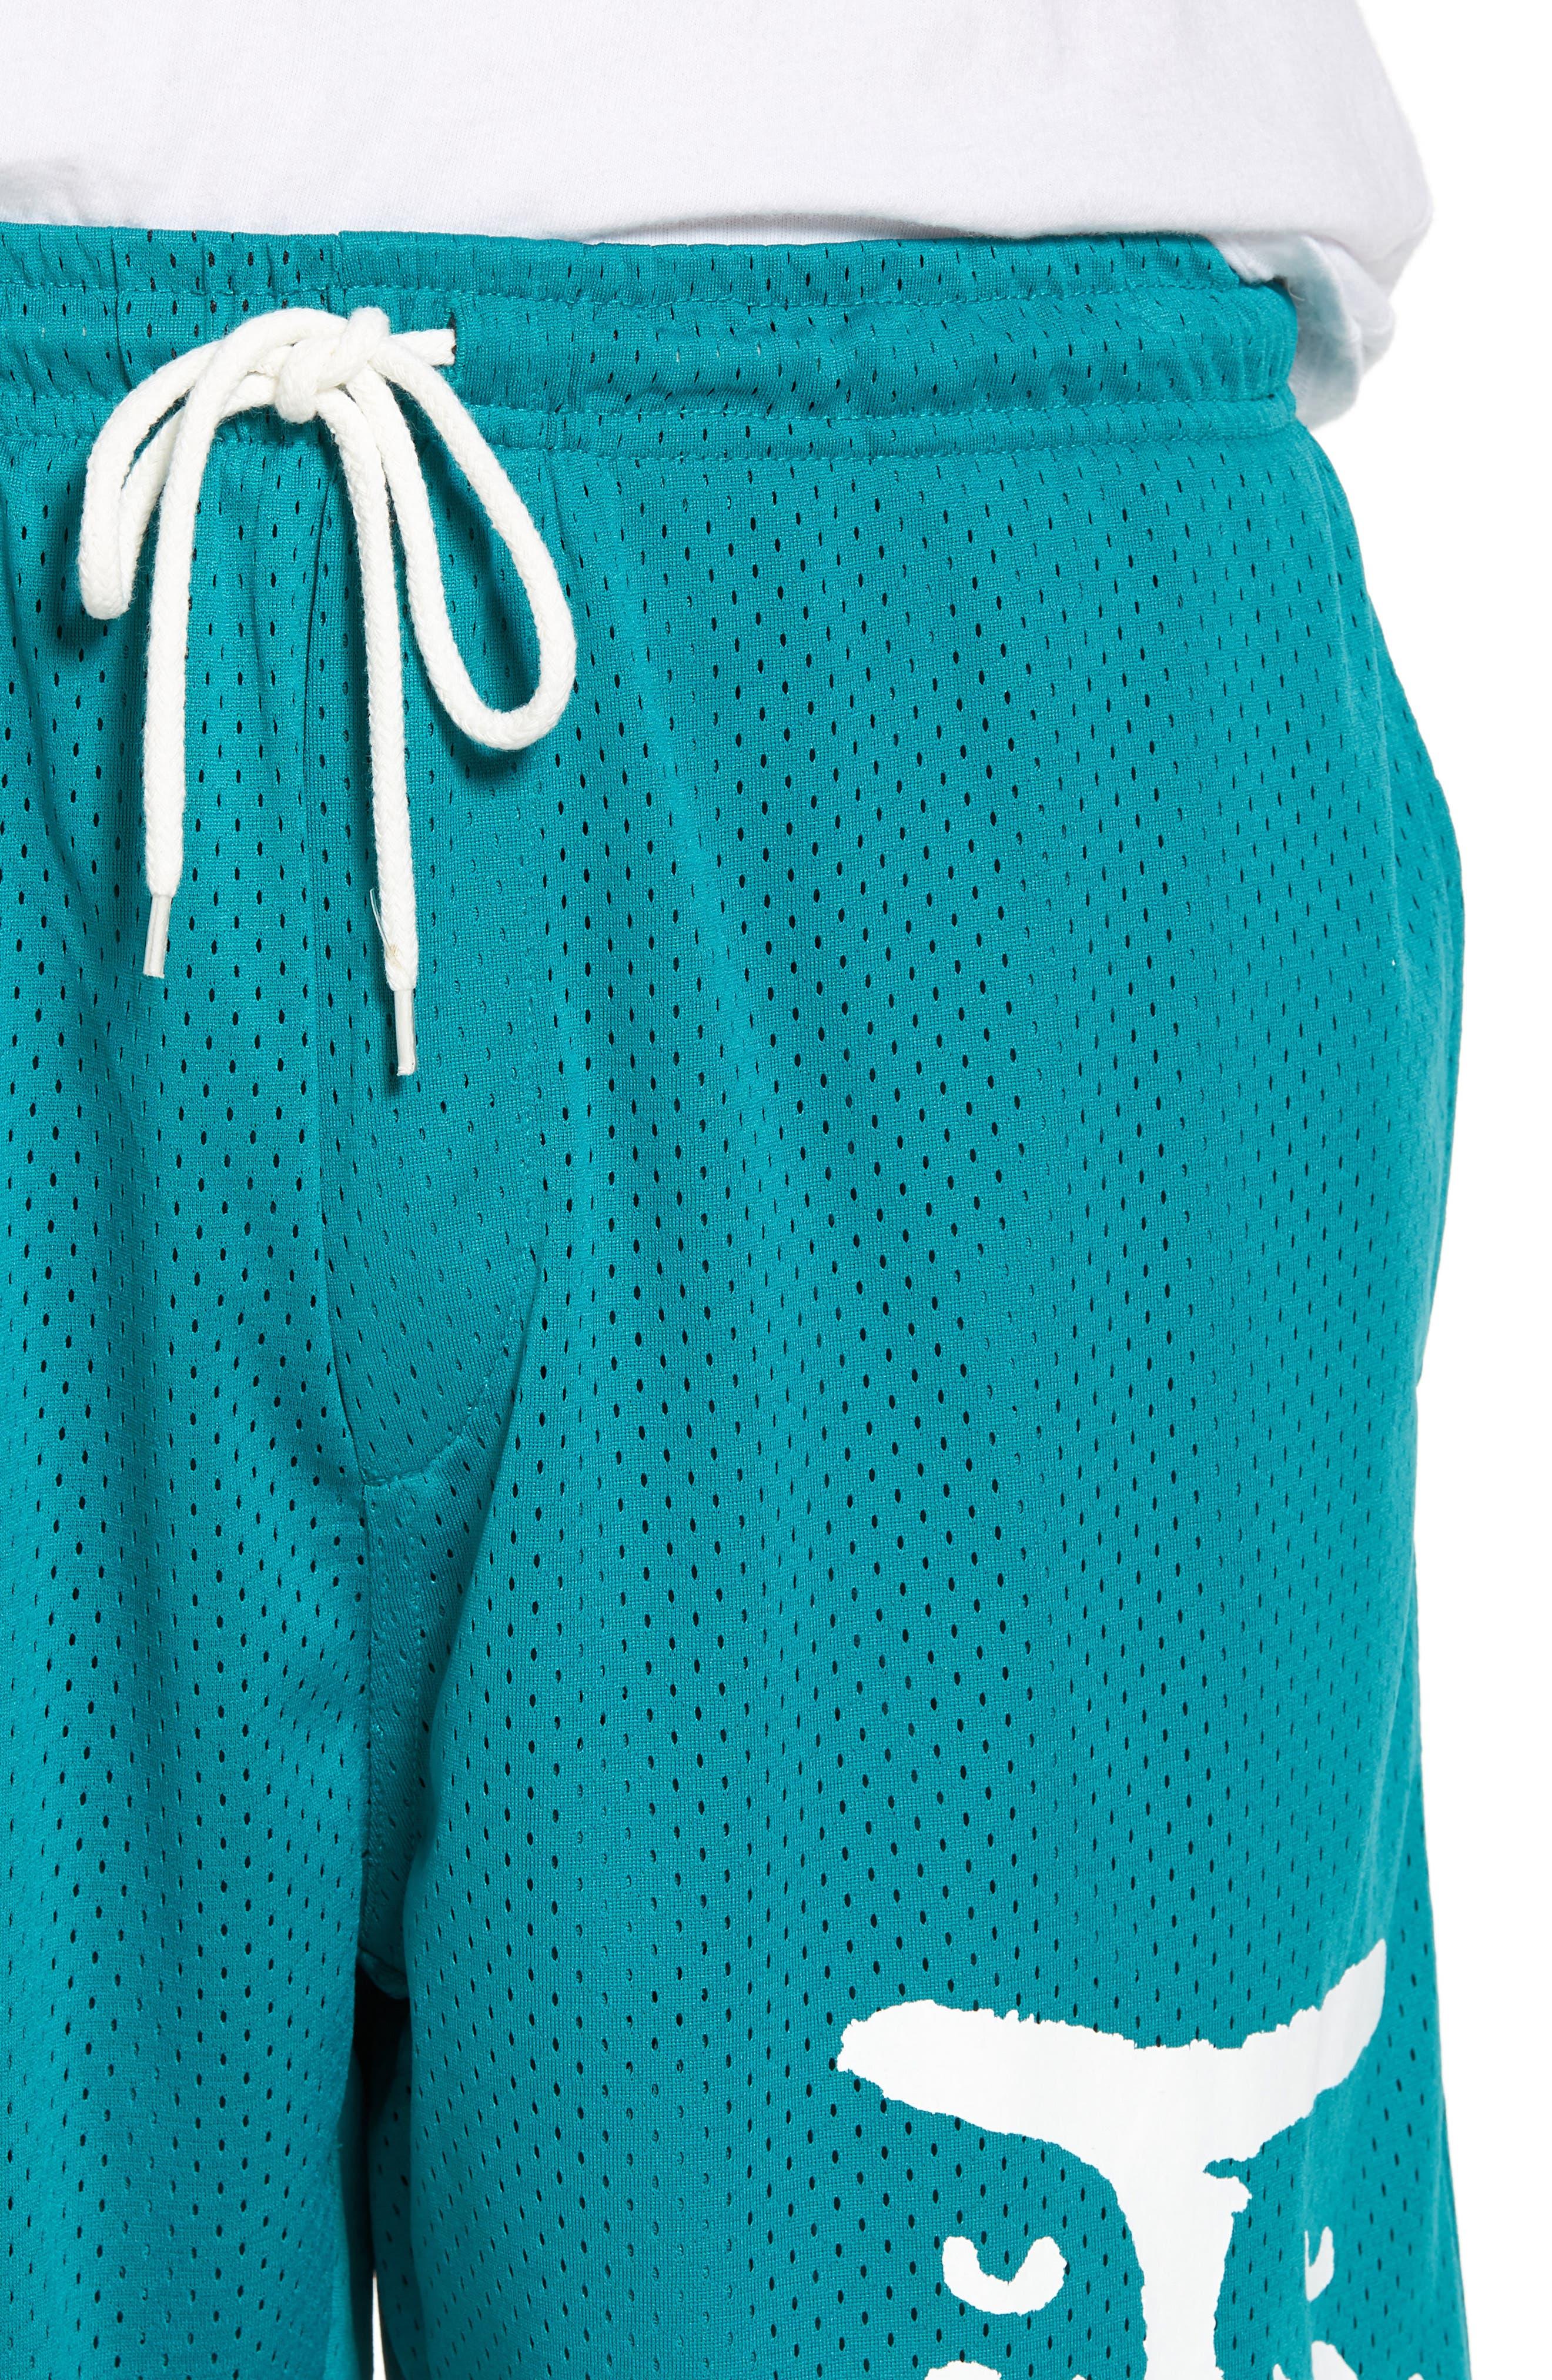 O.P.E. Athletic Shorts,                             Alternate thumbnail 4, color,                             445